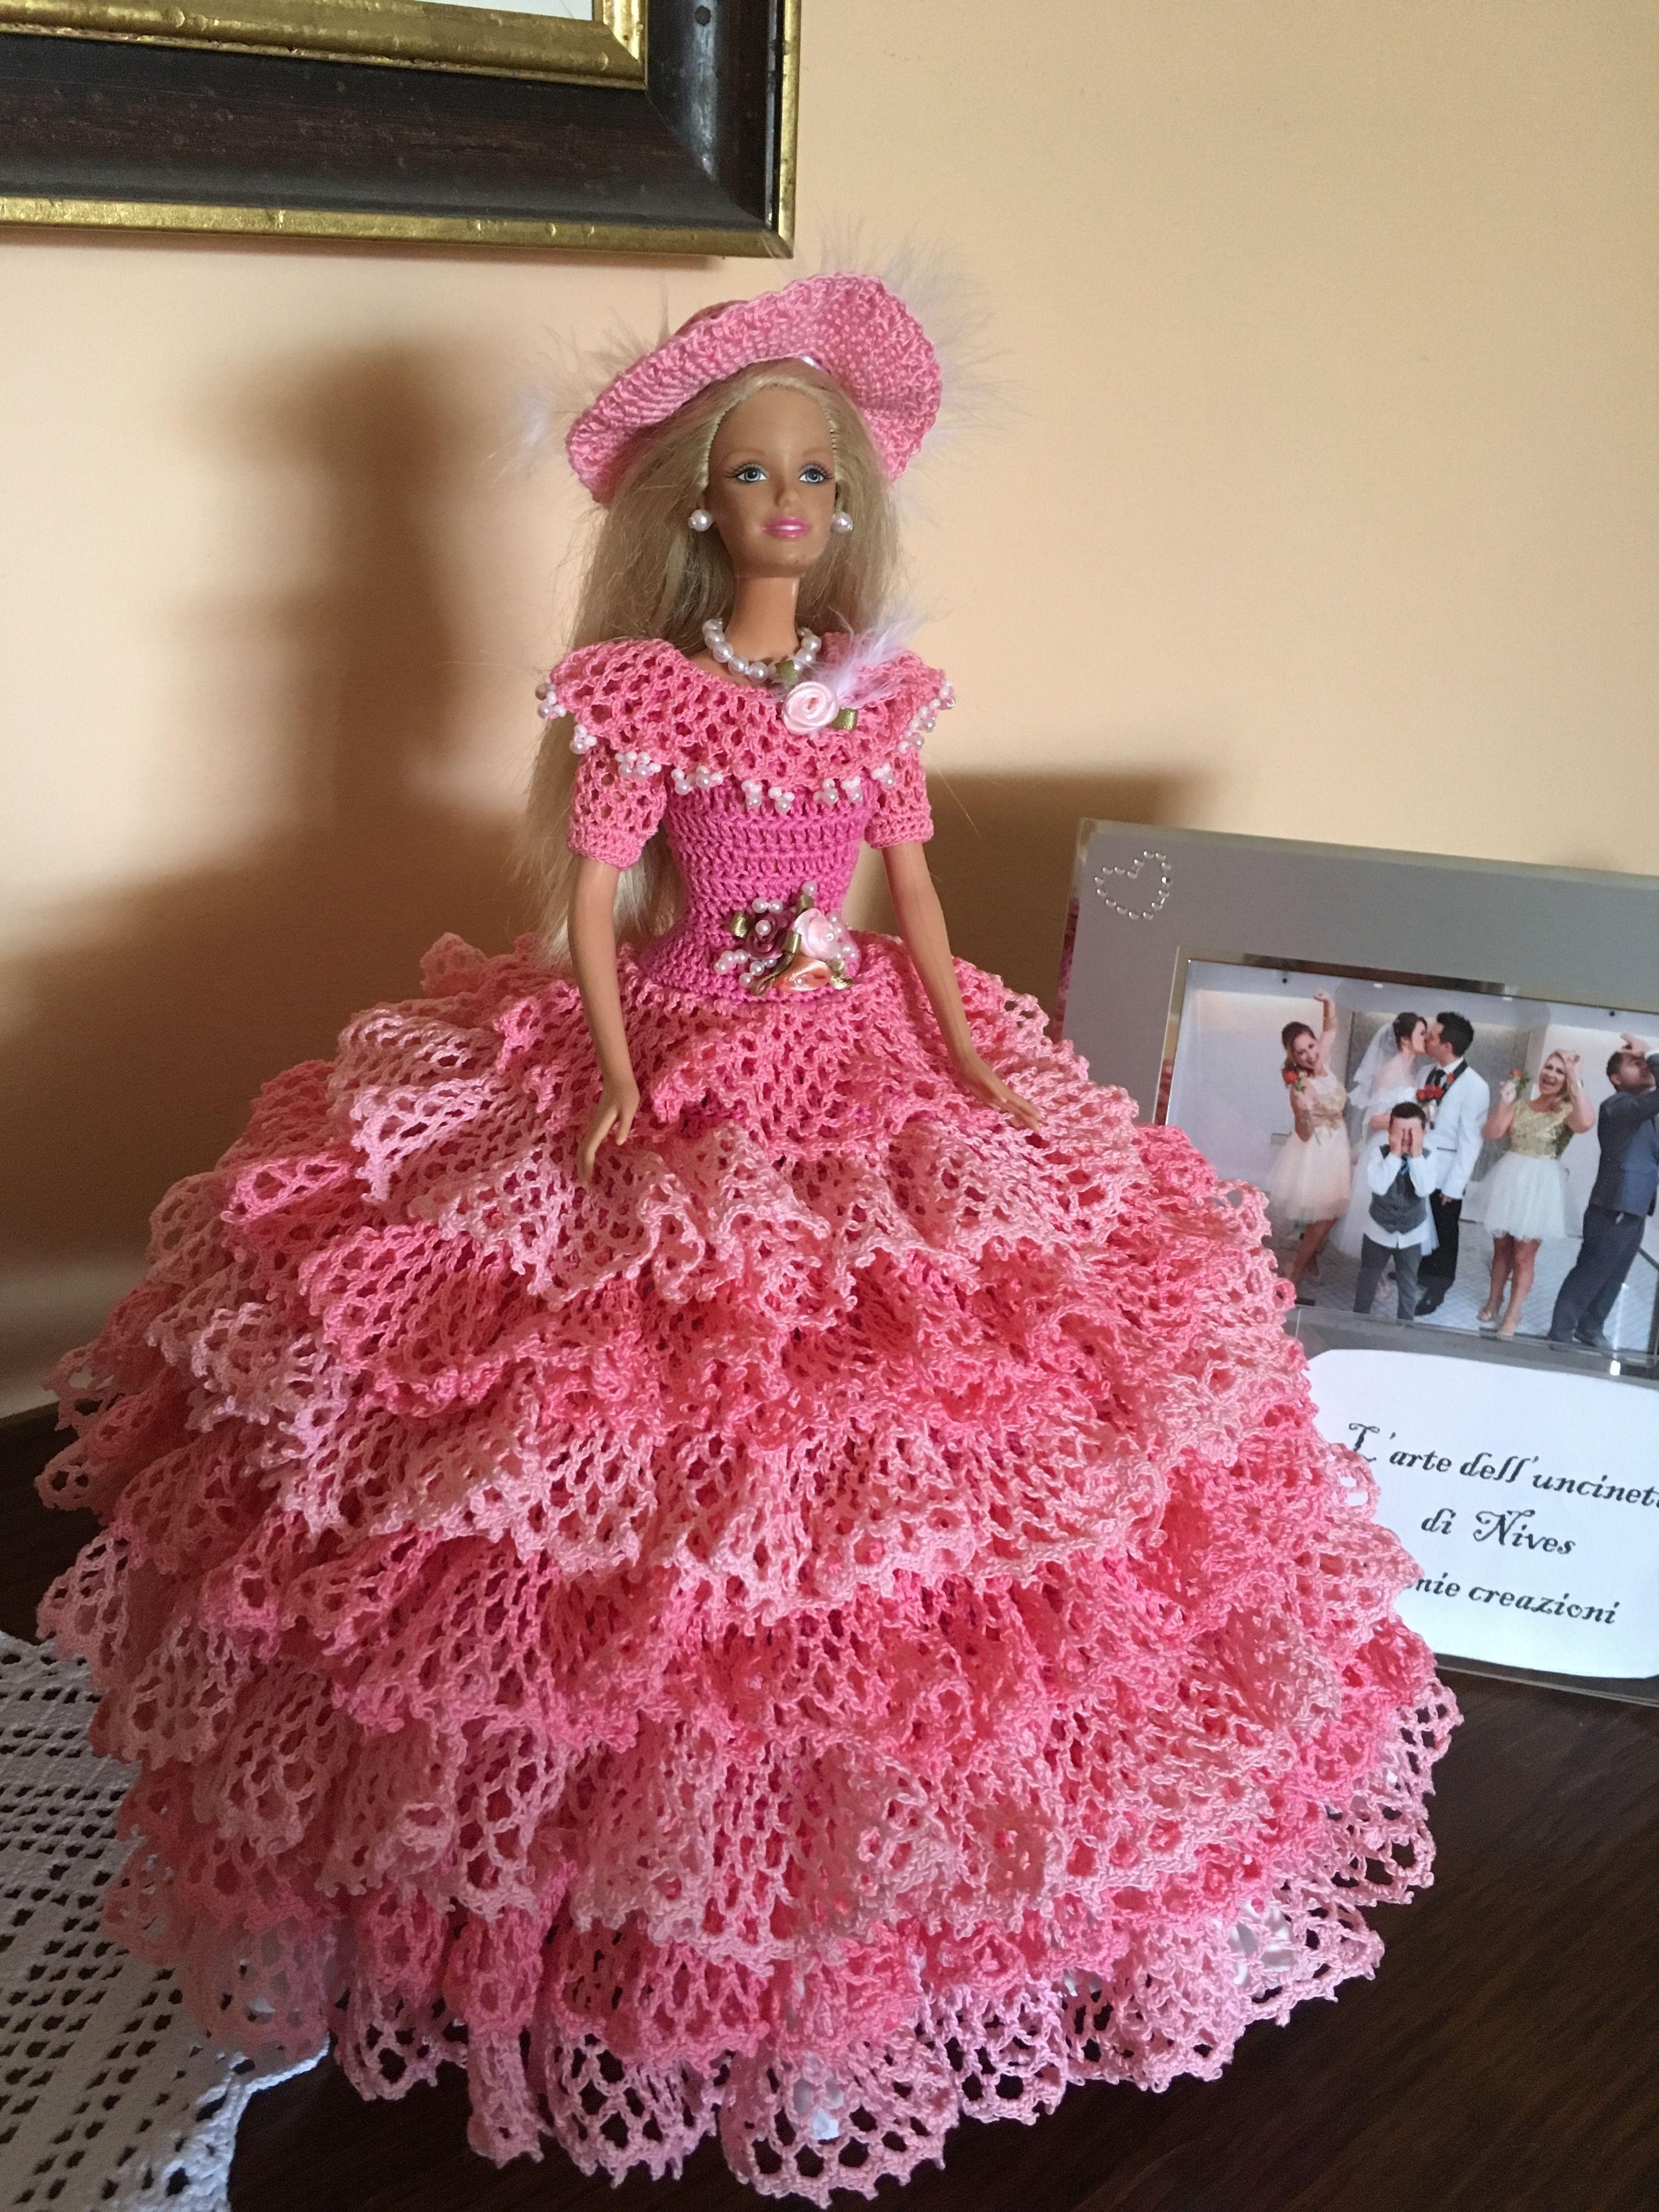 Miss April 1992 Cotillion Barbie Doll Outfit Crochet Pattern Booklet